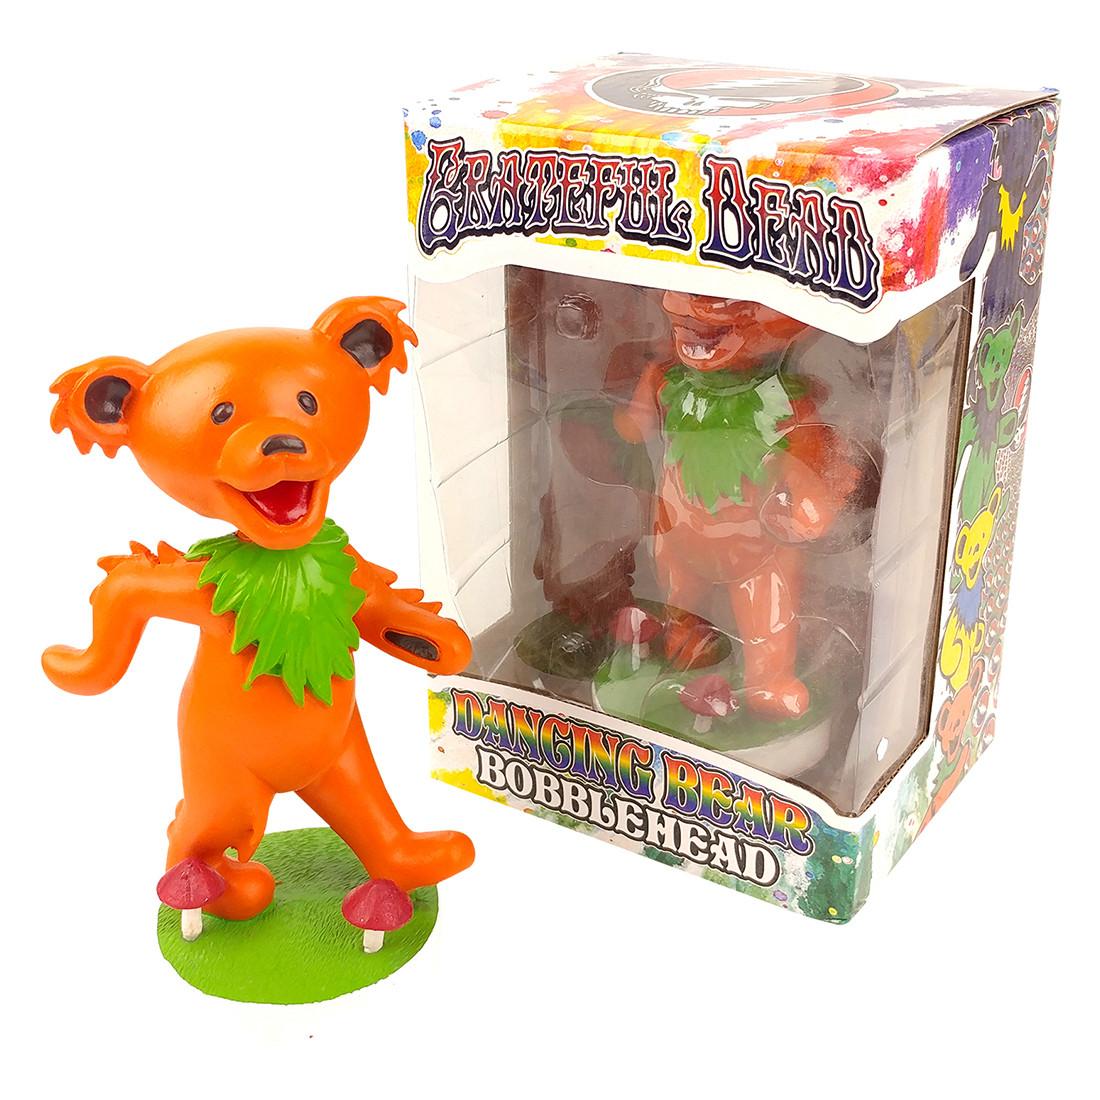 GD Bobblehead Dancing Bear Orange